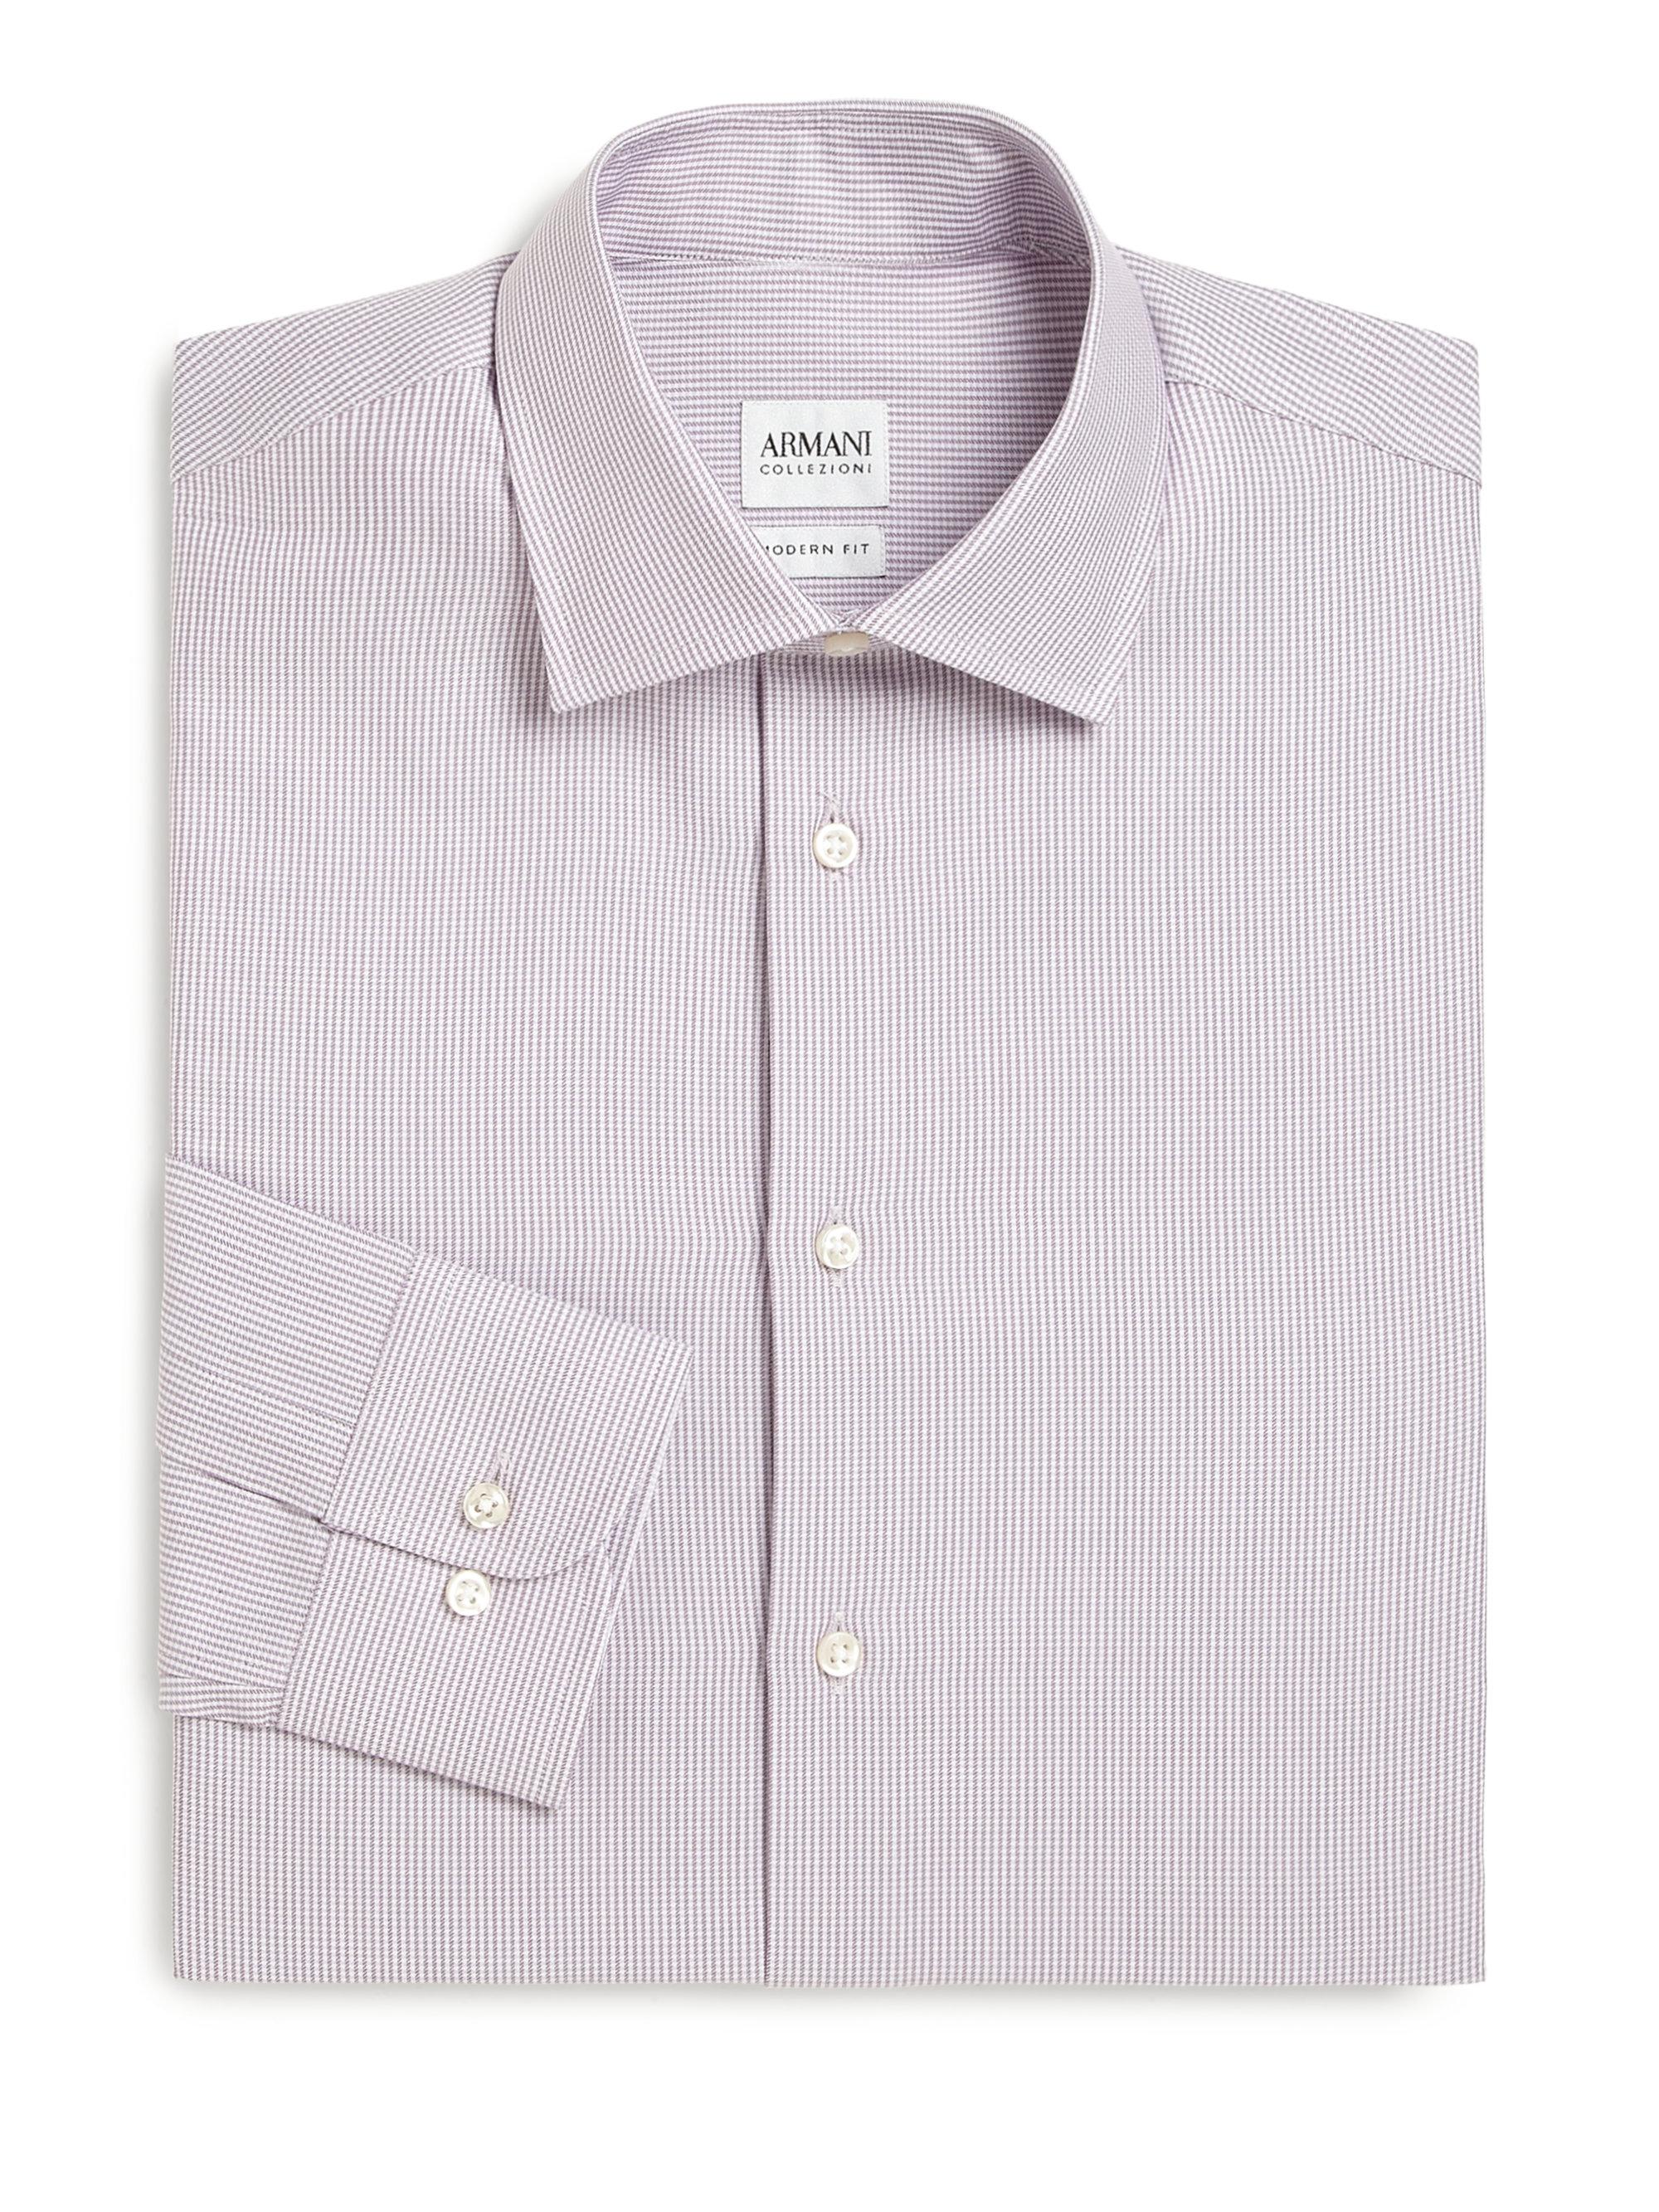 Armani modern fit printed dress shirt in purple for men lyst for Modern fit dress shirt